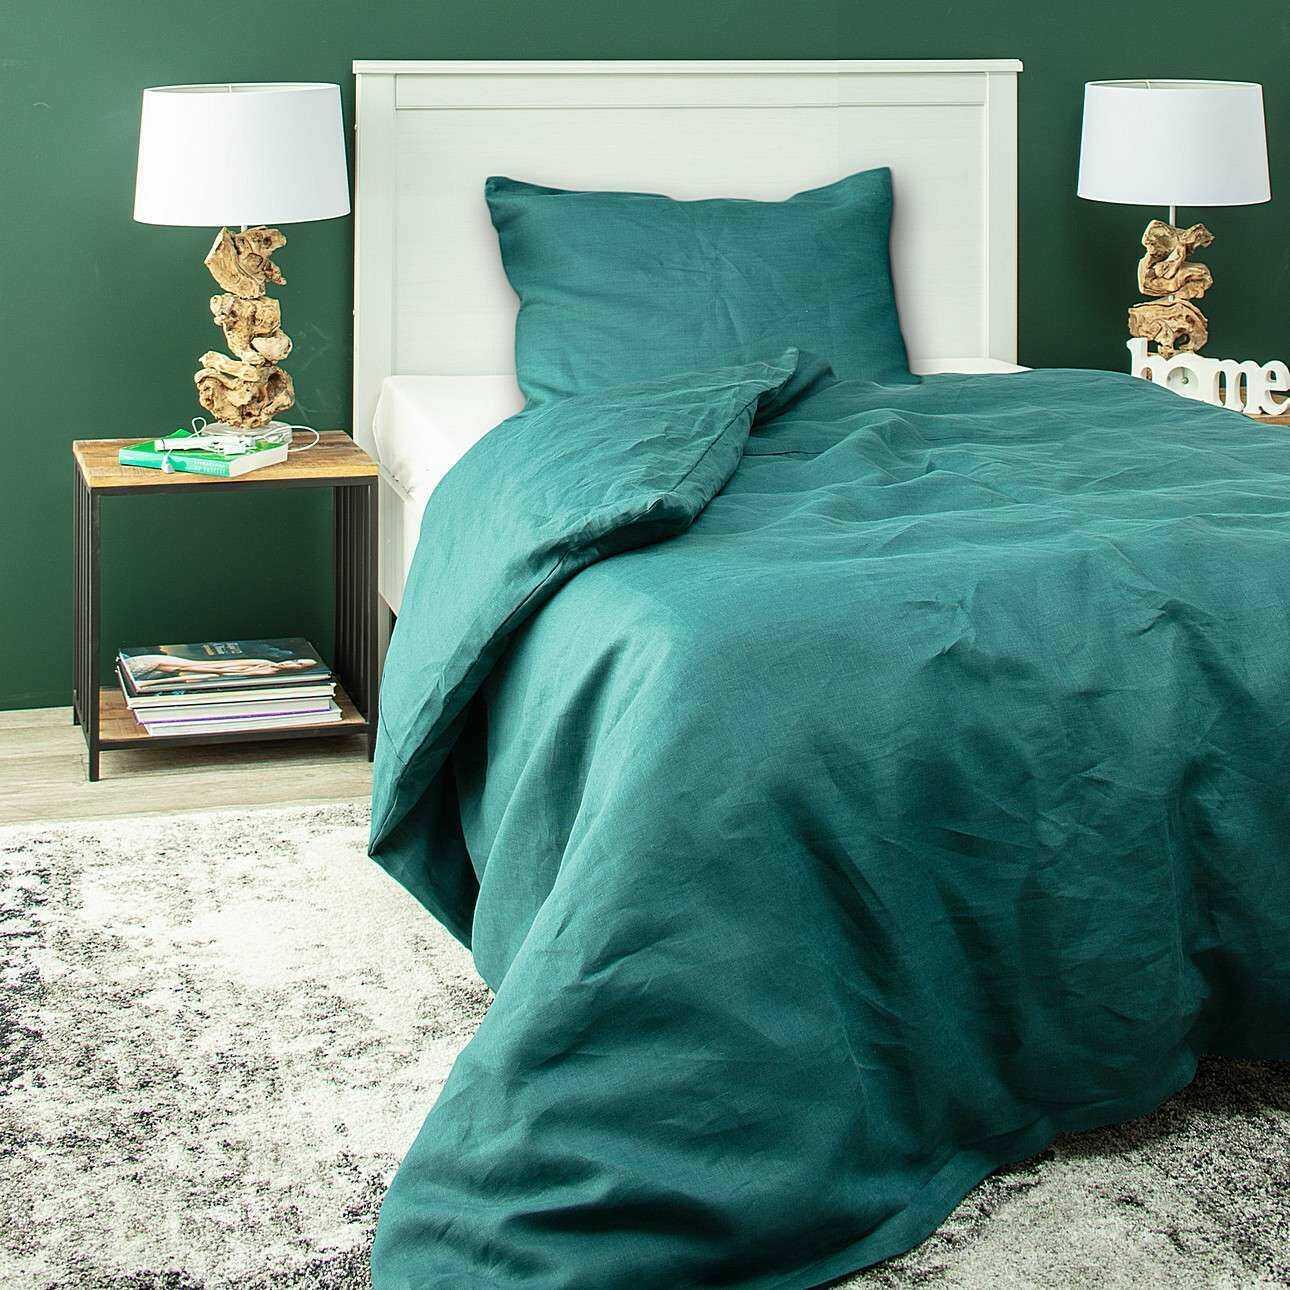 Komplet pościeli lnianej Linen 150x200cm emerald green